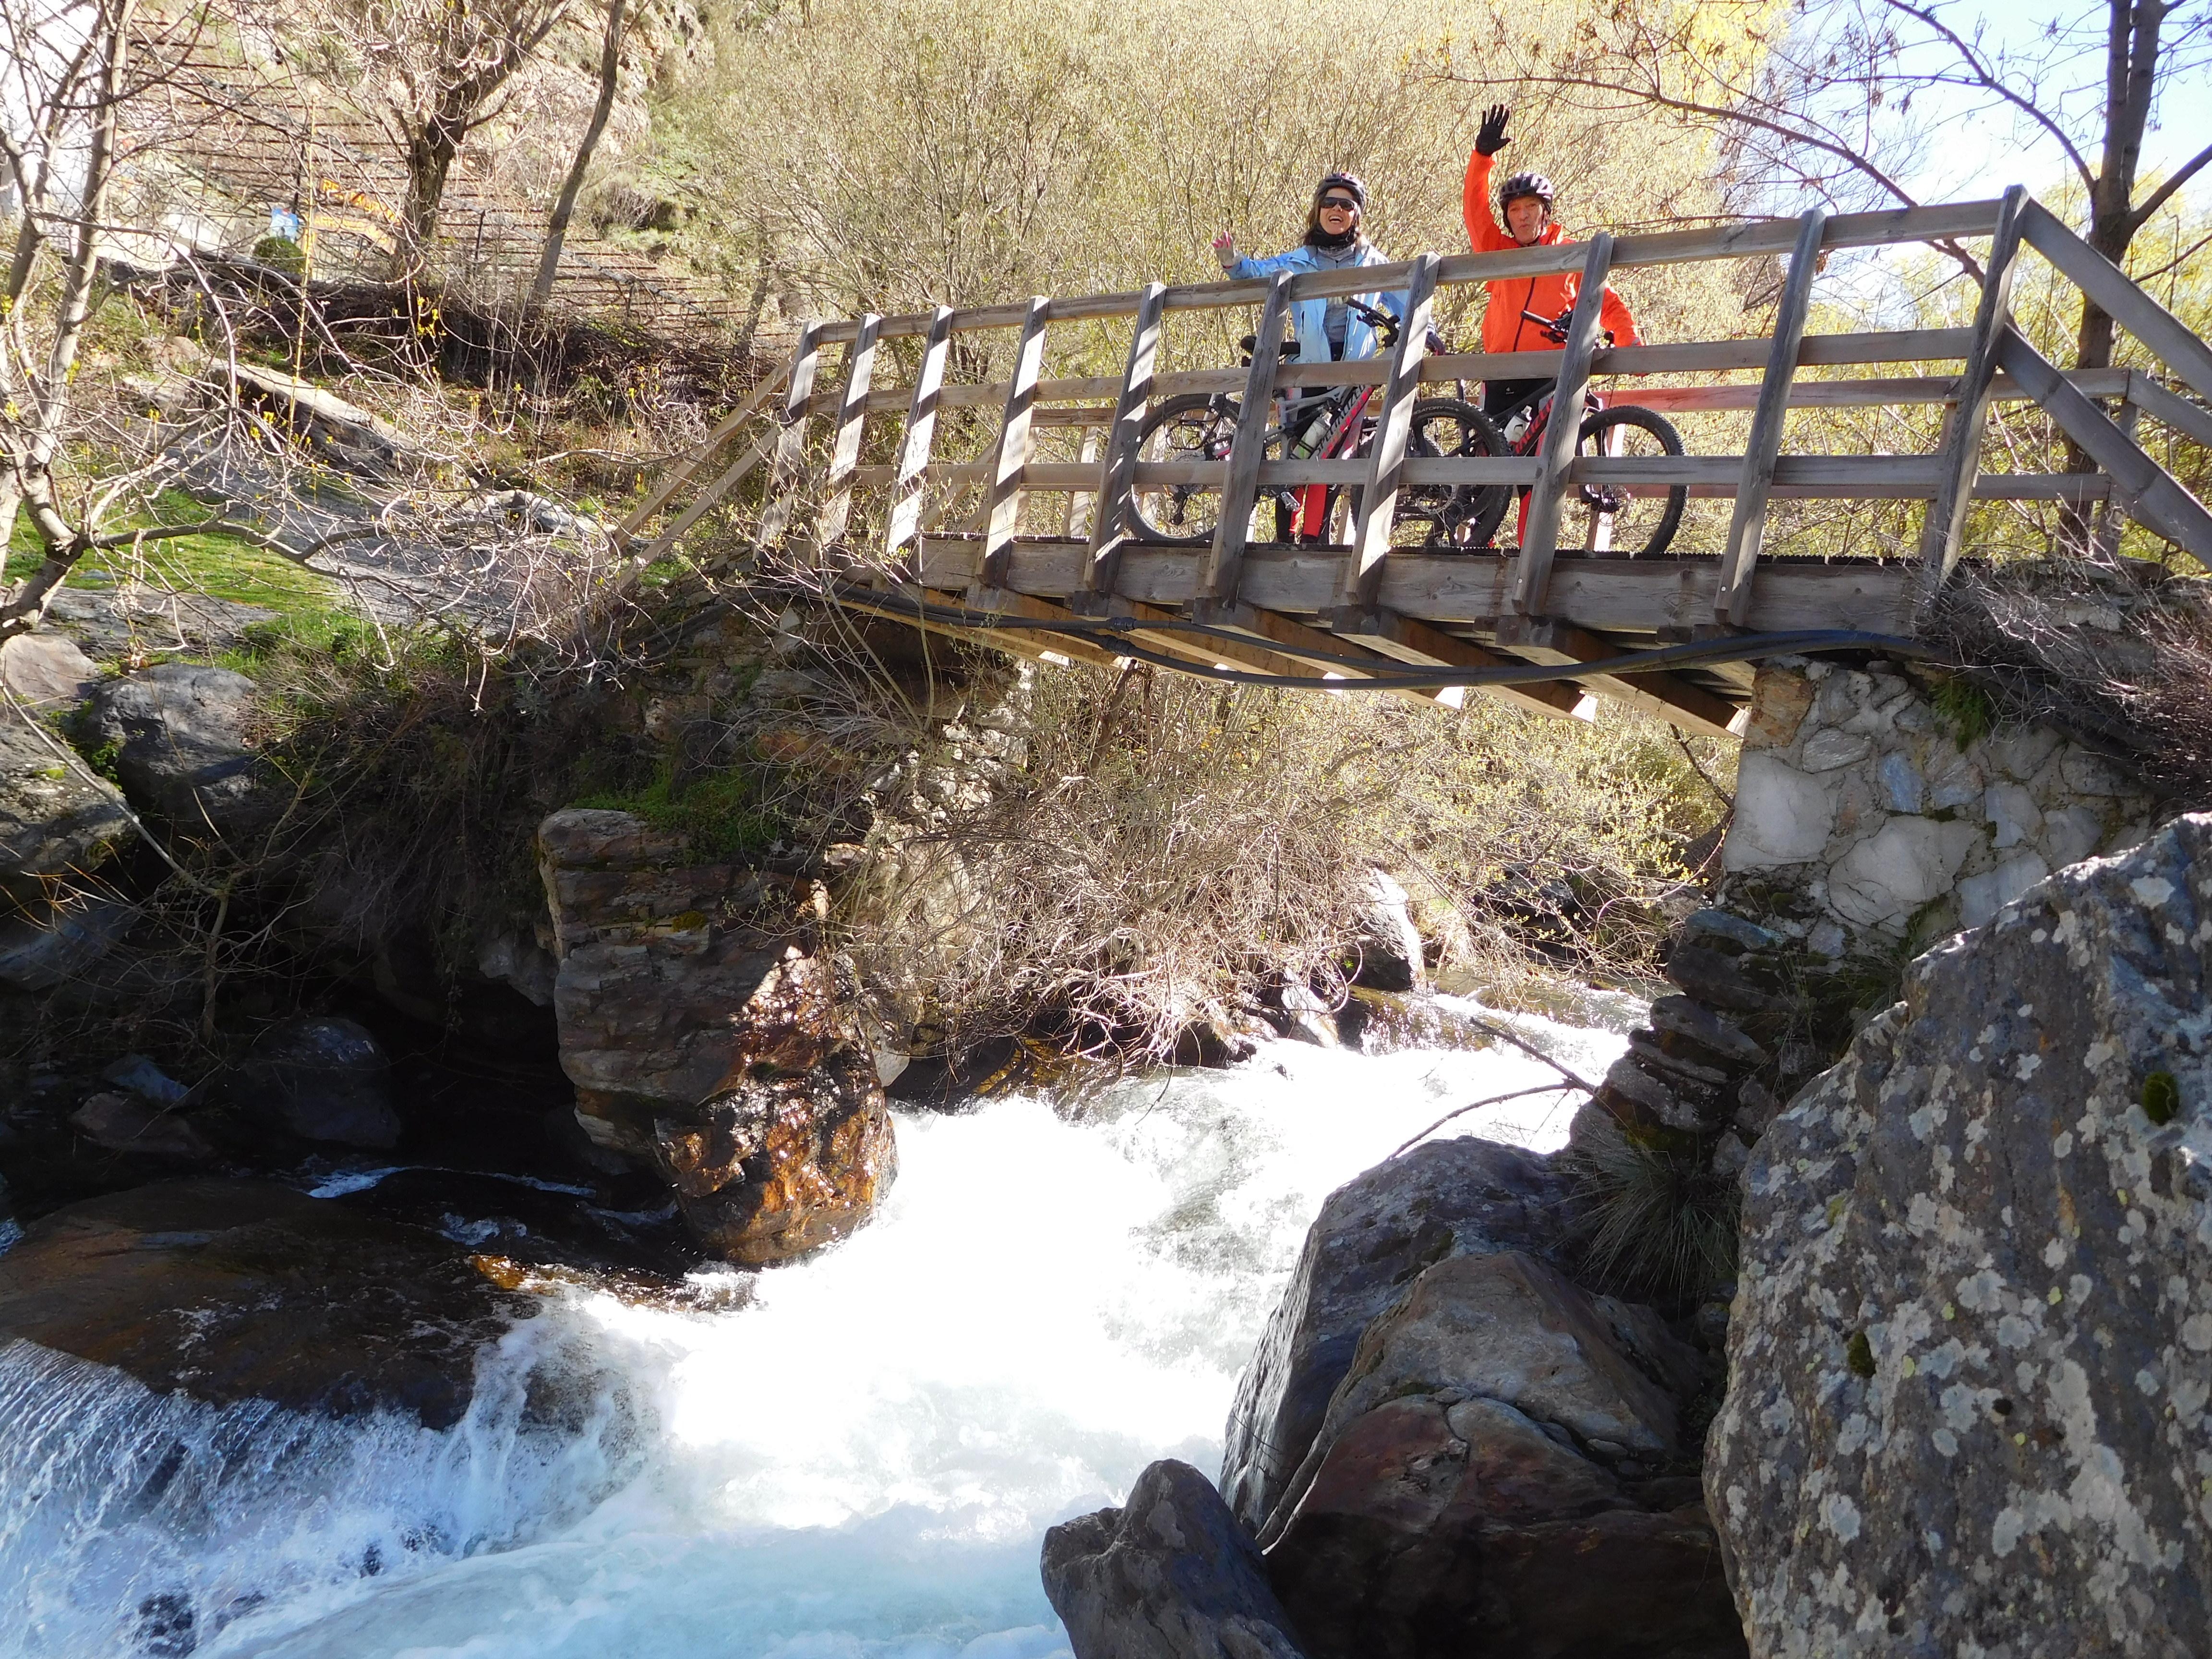 052 Ruta del Tranvia. Guejar Sierra.jpg